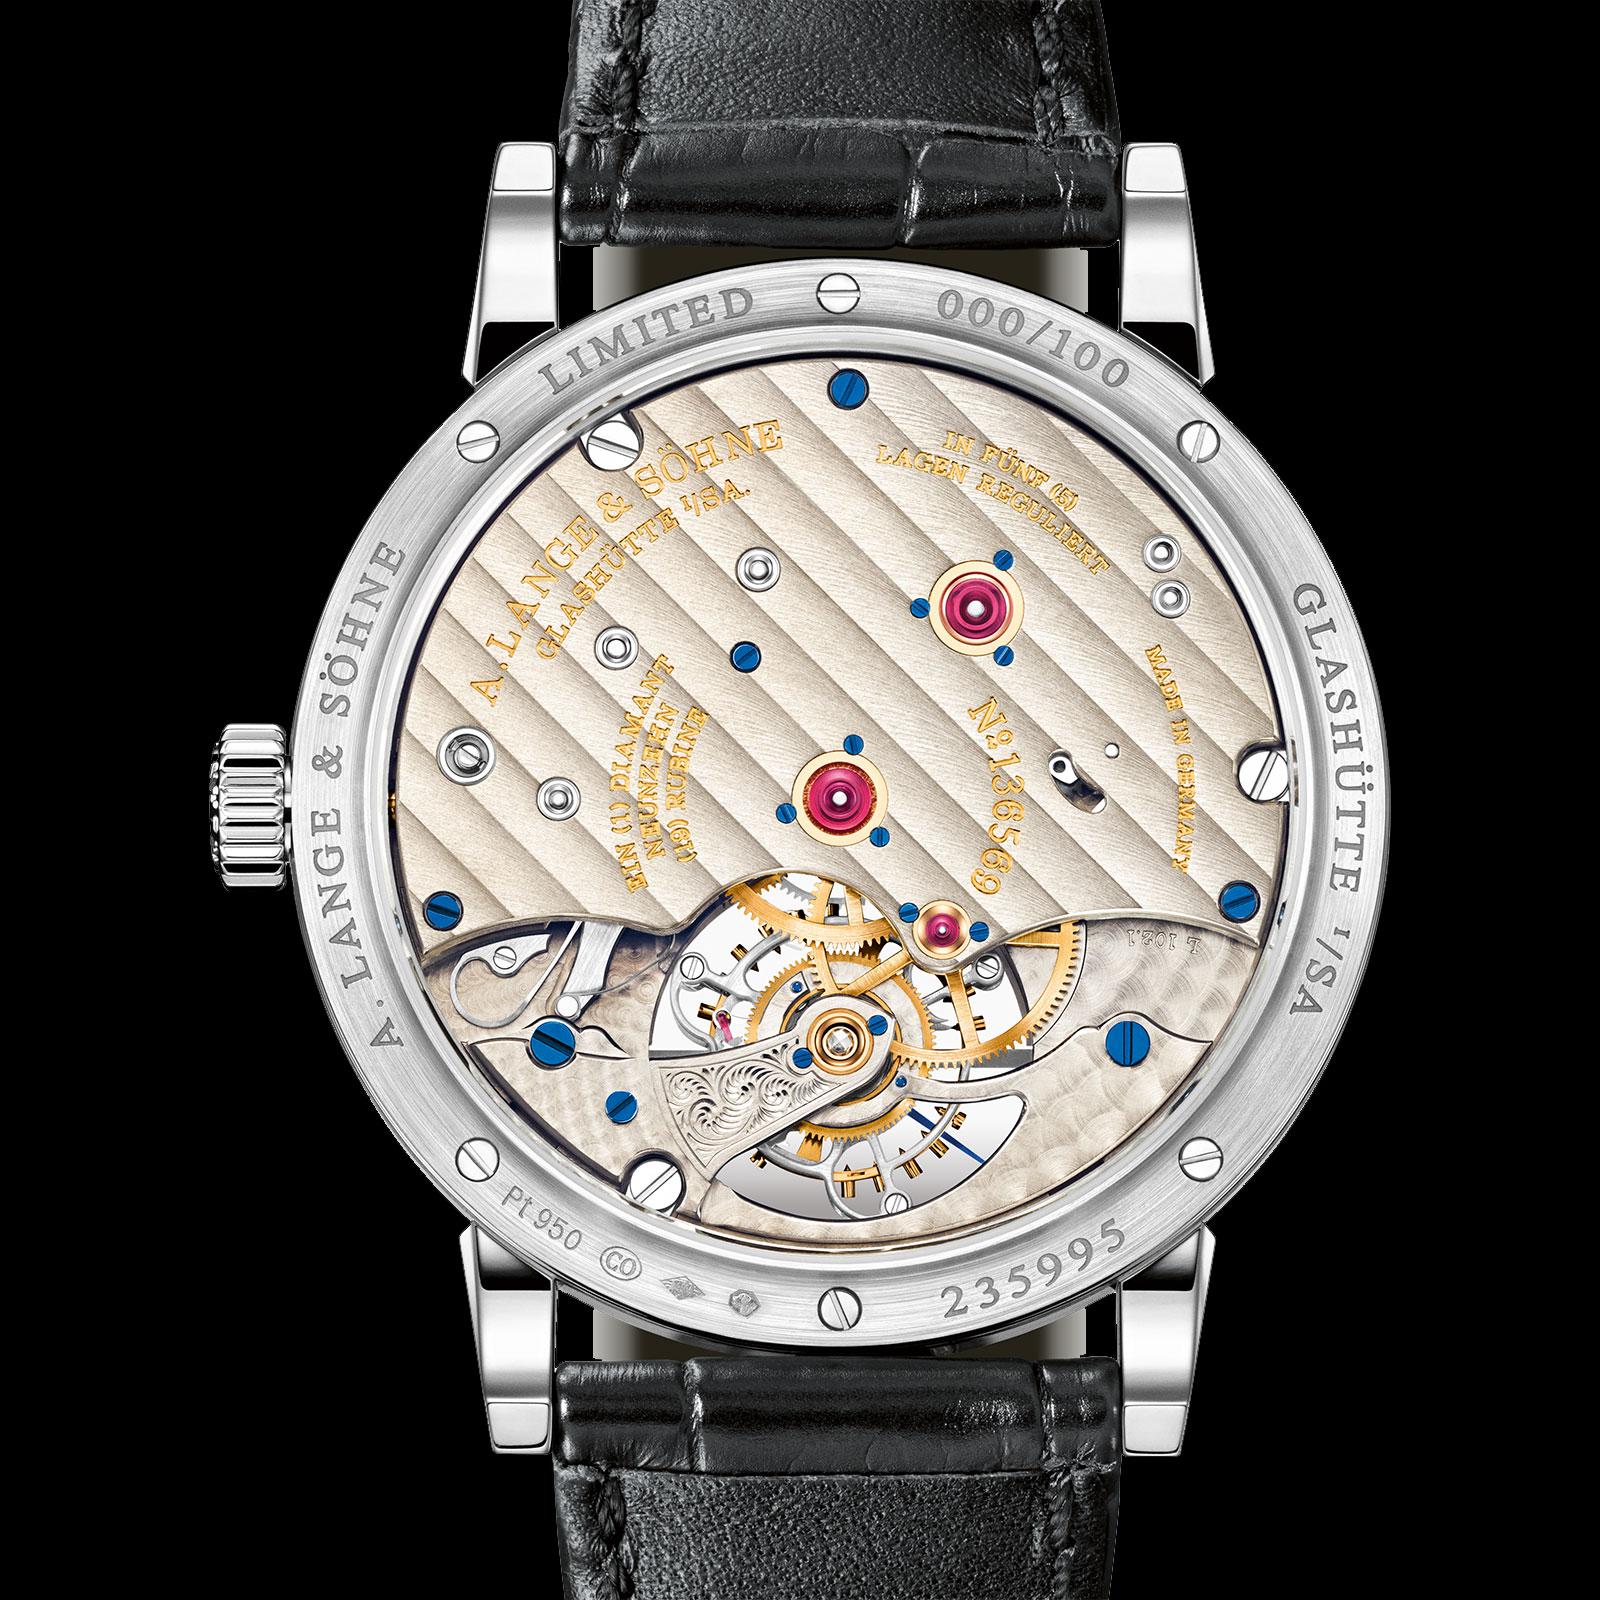 Lange 1815 Tourbillon Enamel Dial platinum 5